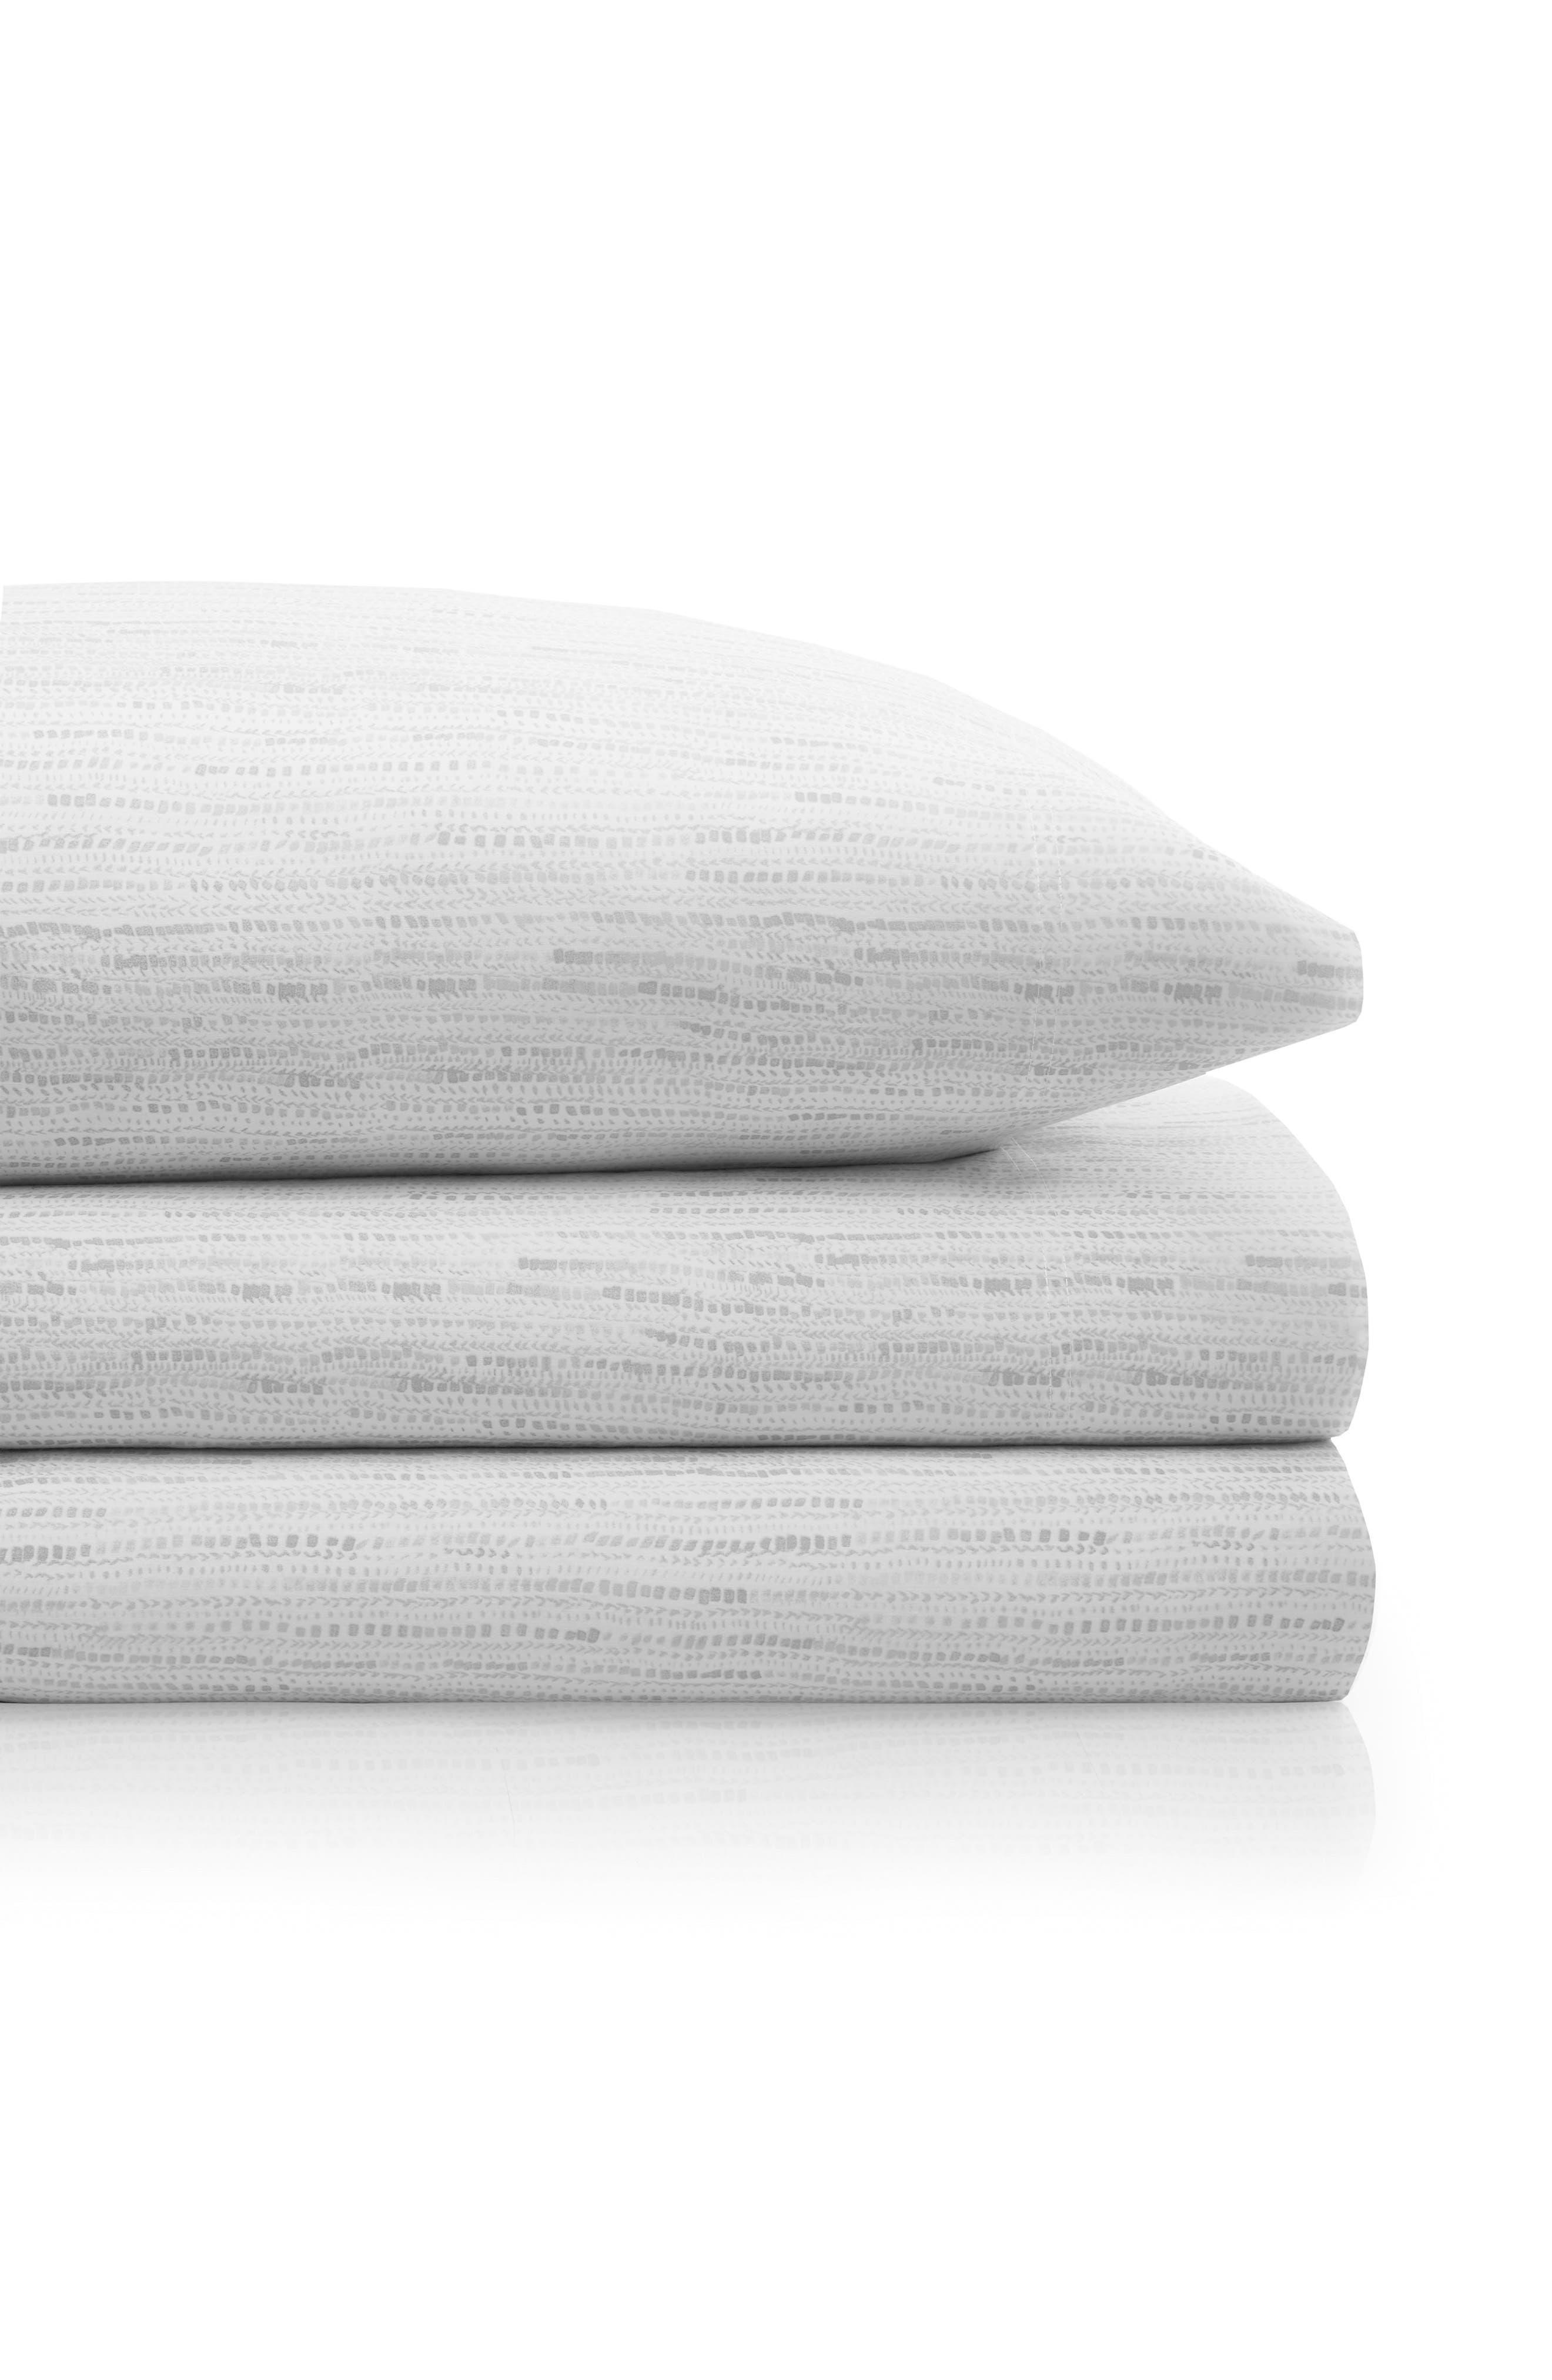 Notch Stripe 200 Thread Count Sheet Set,                         Main,                         color, White